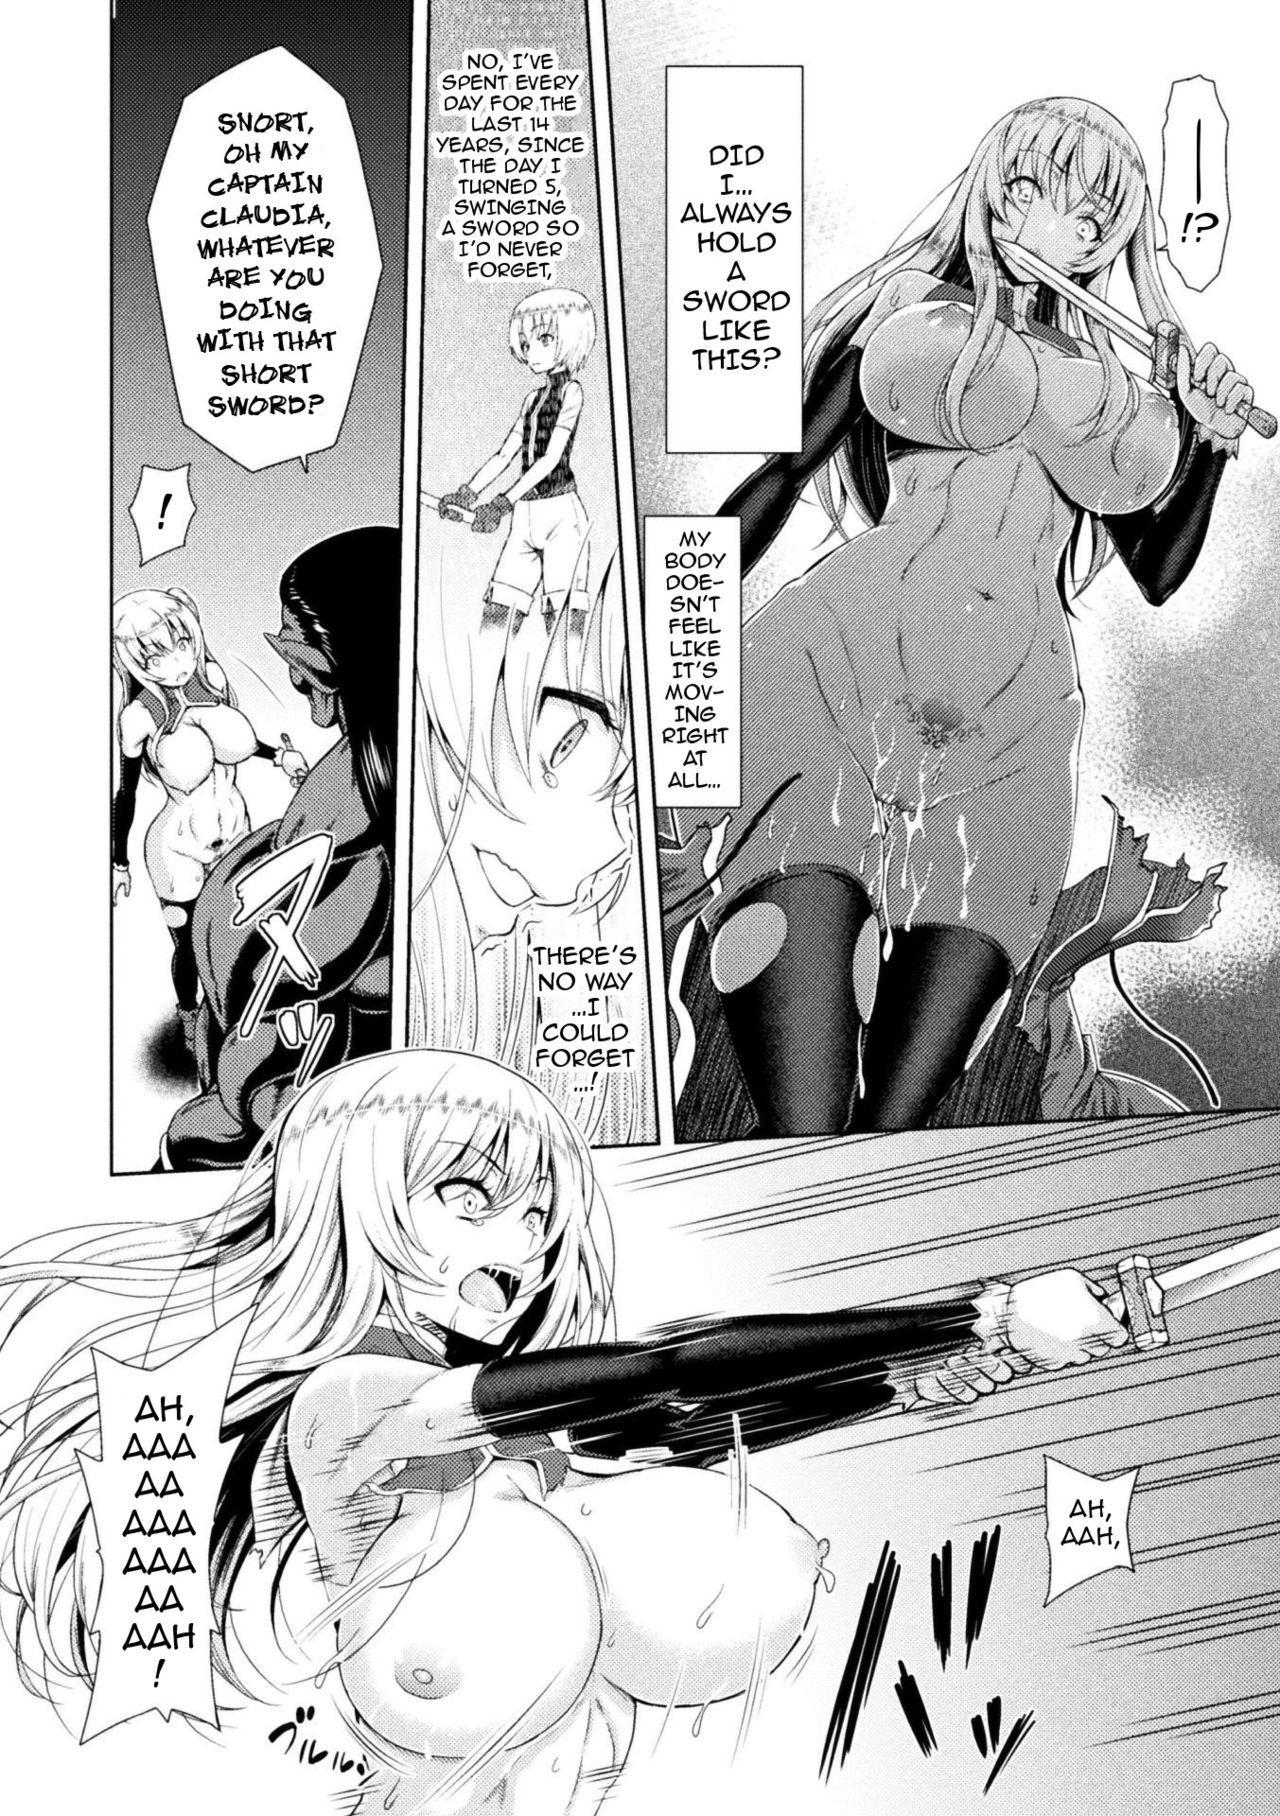 [Yamada Gogogo] Erona ~Orc no Inmon ni Okasareta Onna Kishi no Matsuro~ | Erona ~The Fall of a Beautiful Knight Cursed with the Lewd Mark of an Orc~ [English] {darknight} 42